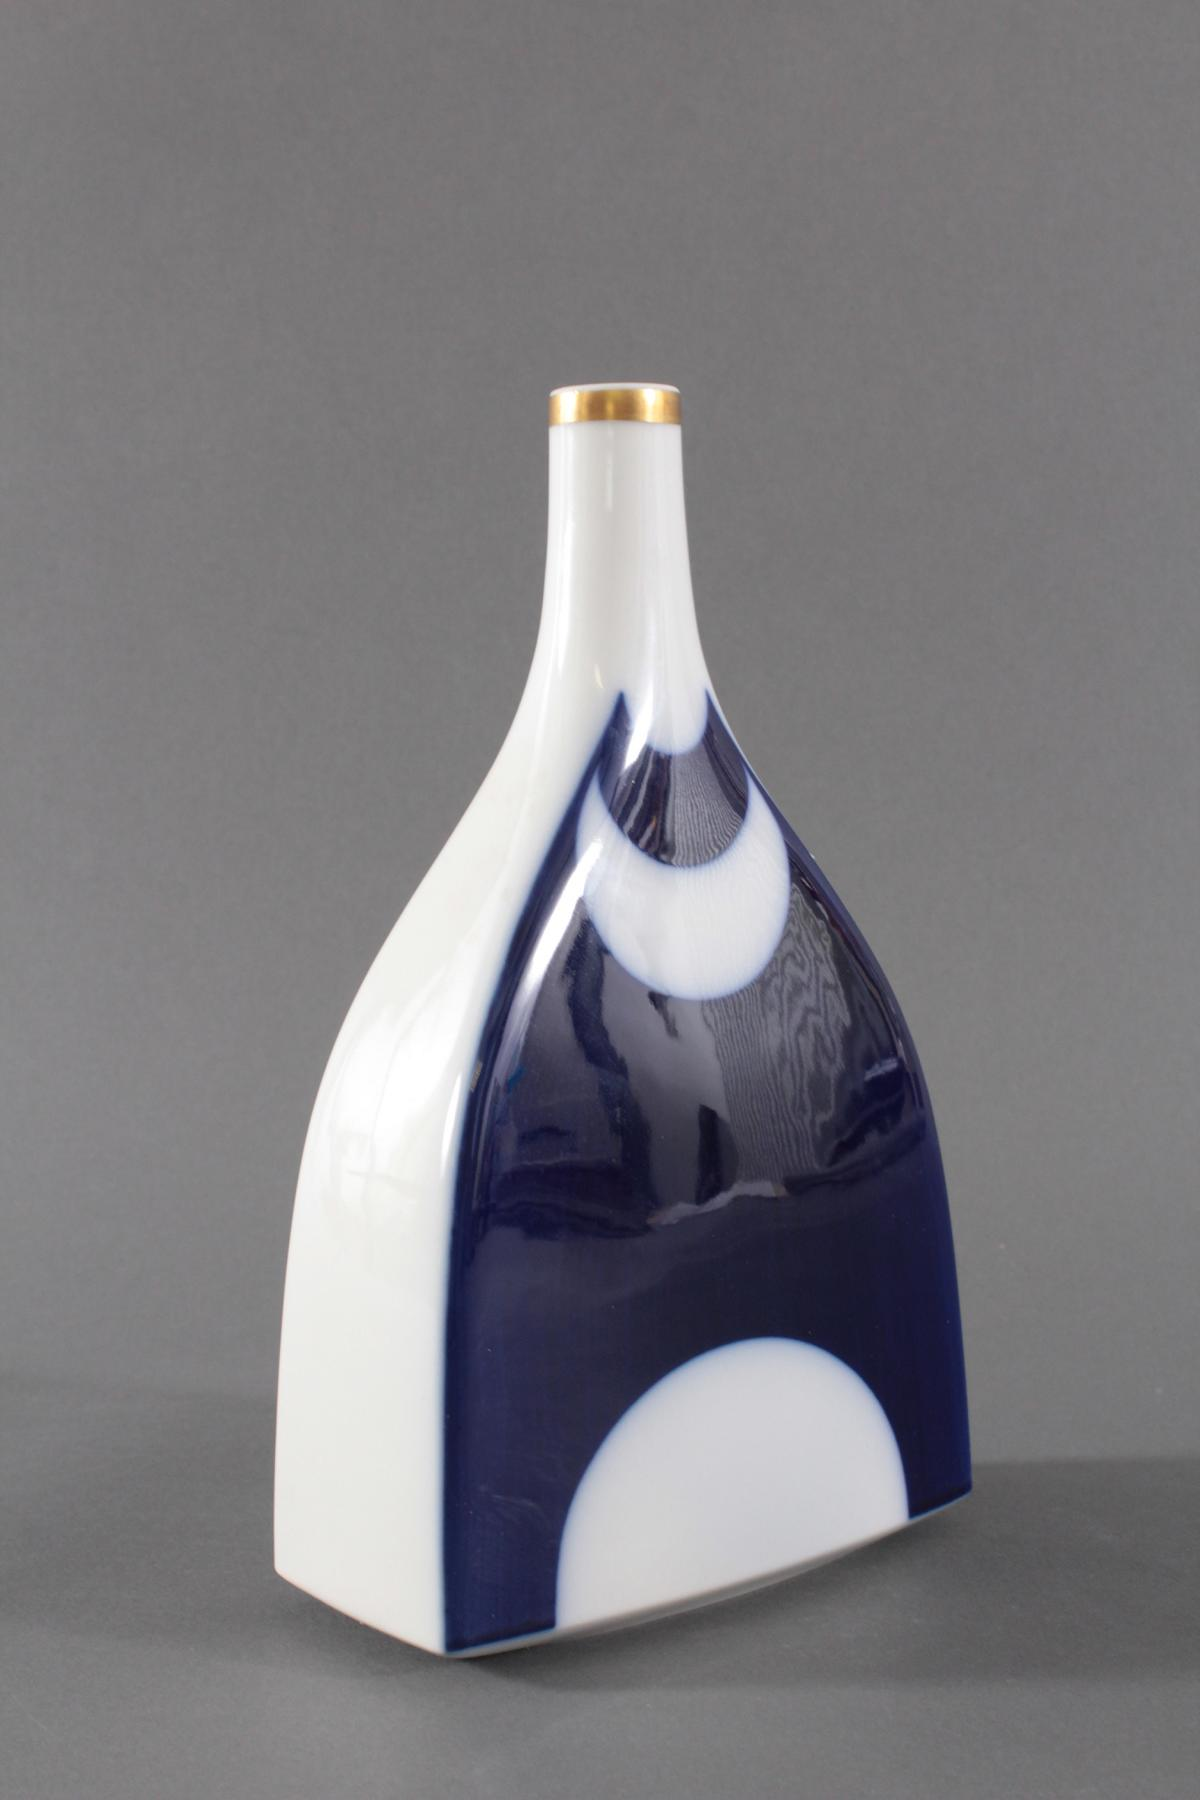 Vase, KPM Berlin, 1. Wahl, Entwurf: Trude Petri-2